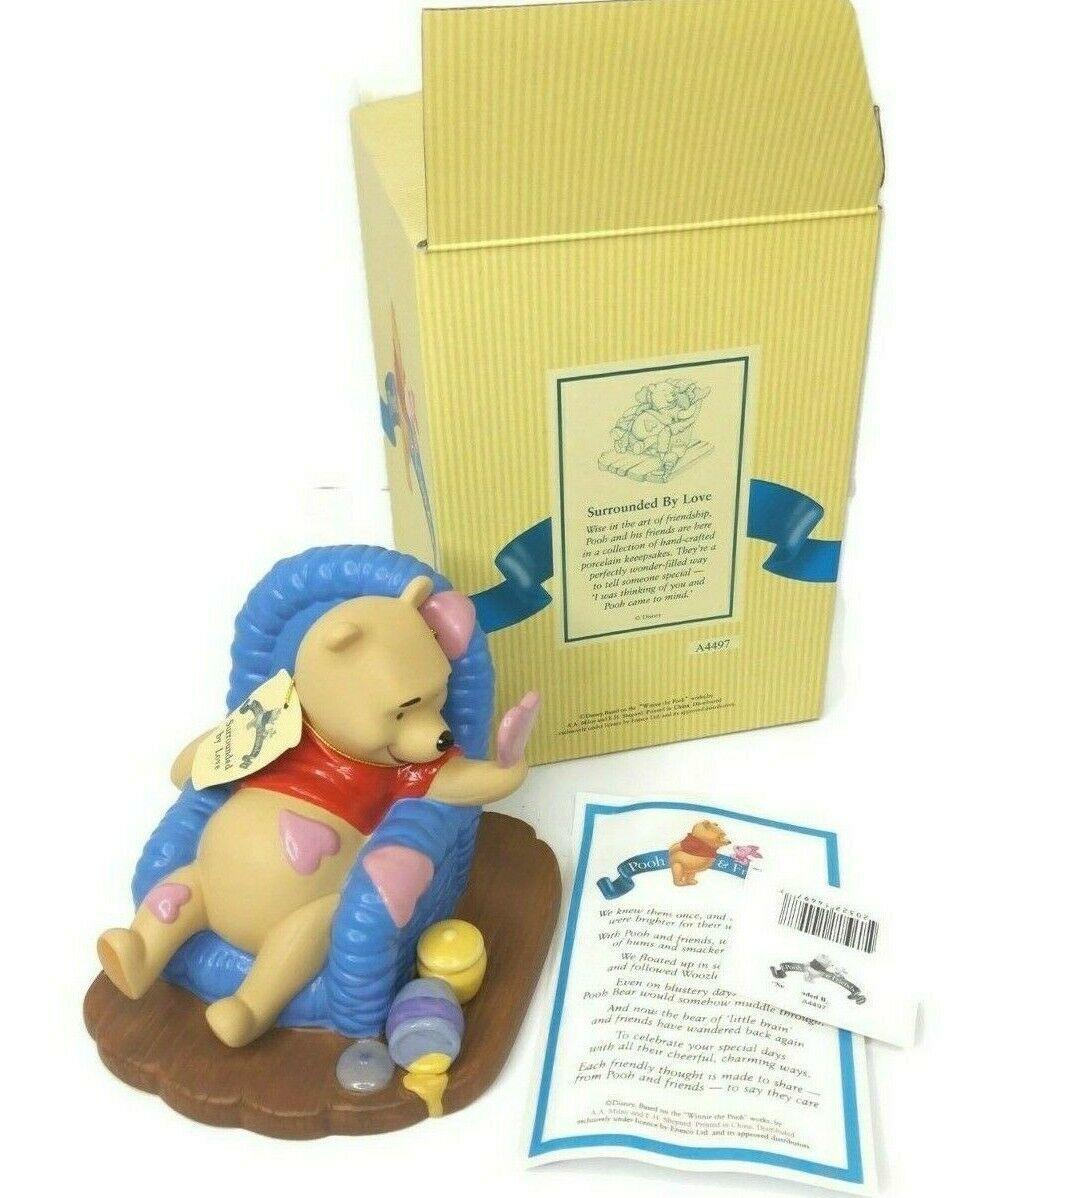 Walt Disney Winnie the Pooh & Friends 'Surrounded By Love' Figure Retired - $49.49